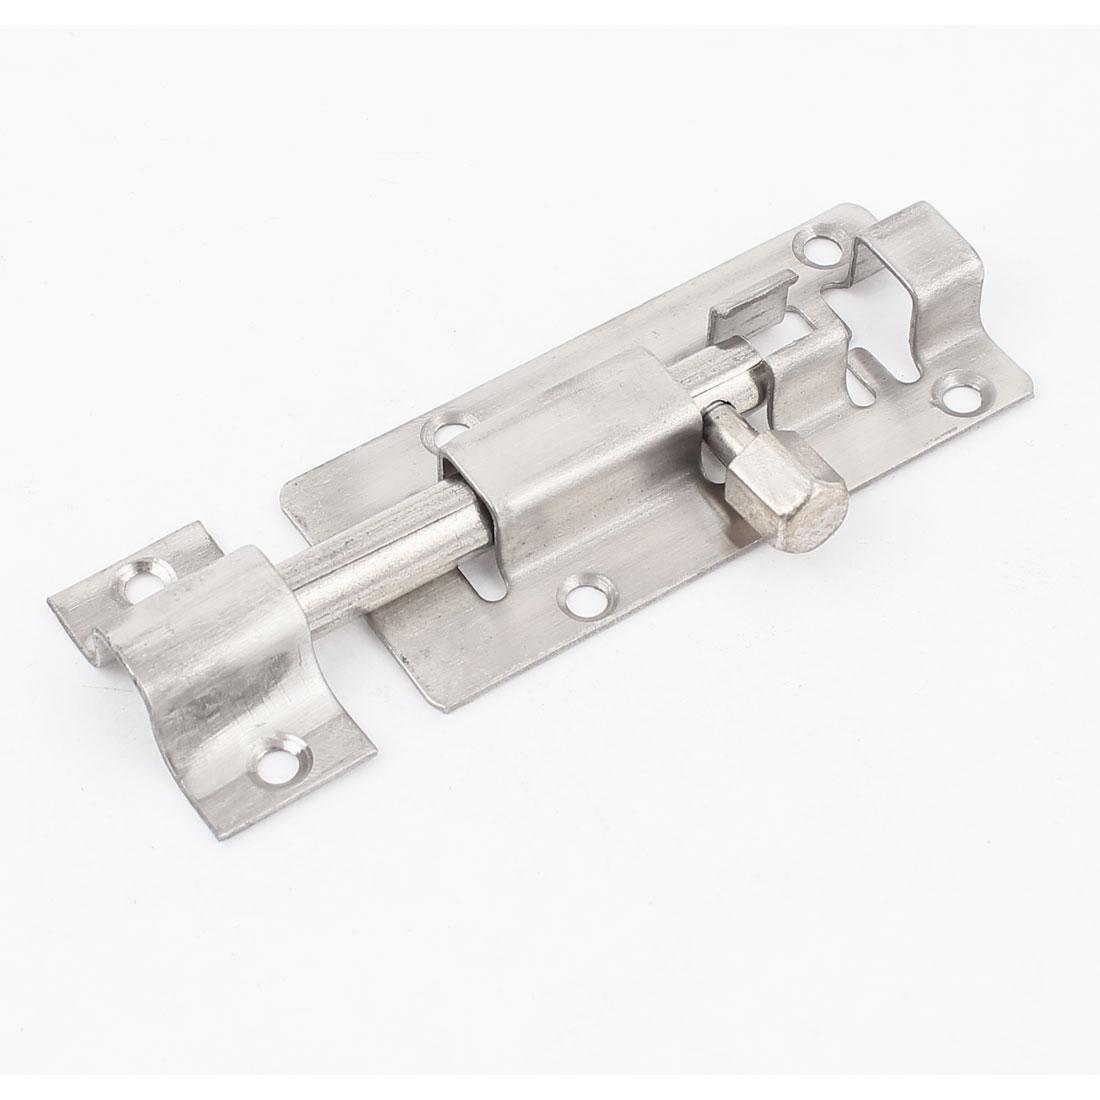 "3"" Long Stainless Steel Door Gates Security Latch Slide Lock Barrel Bolt"